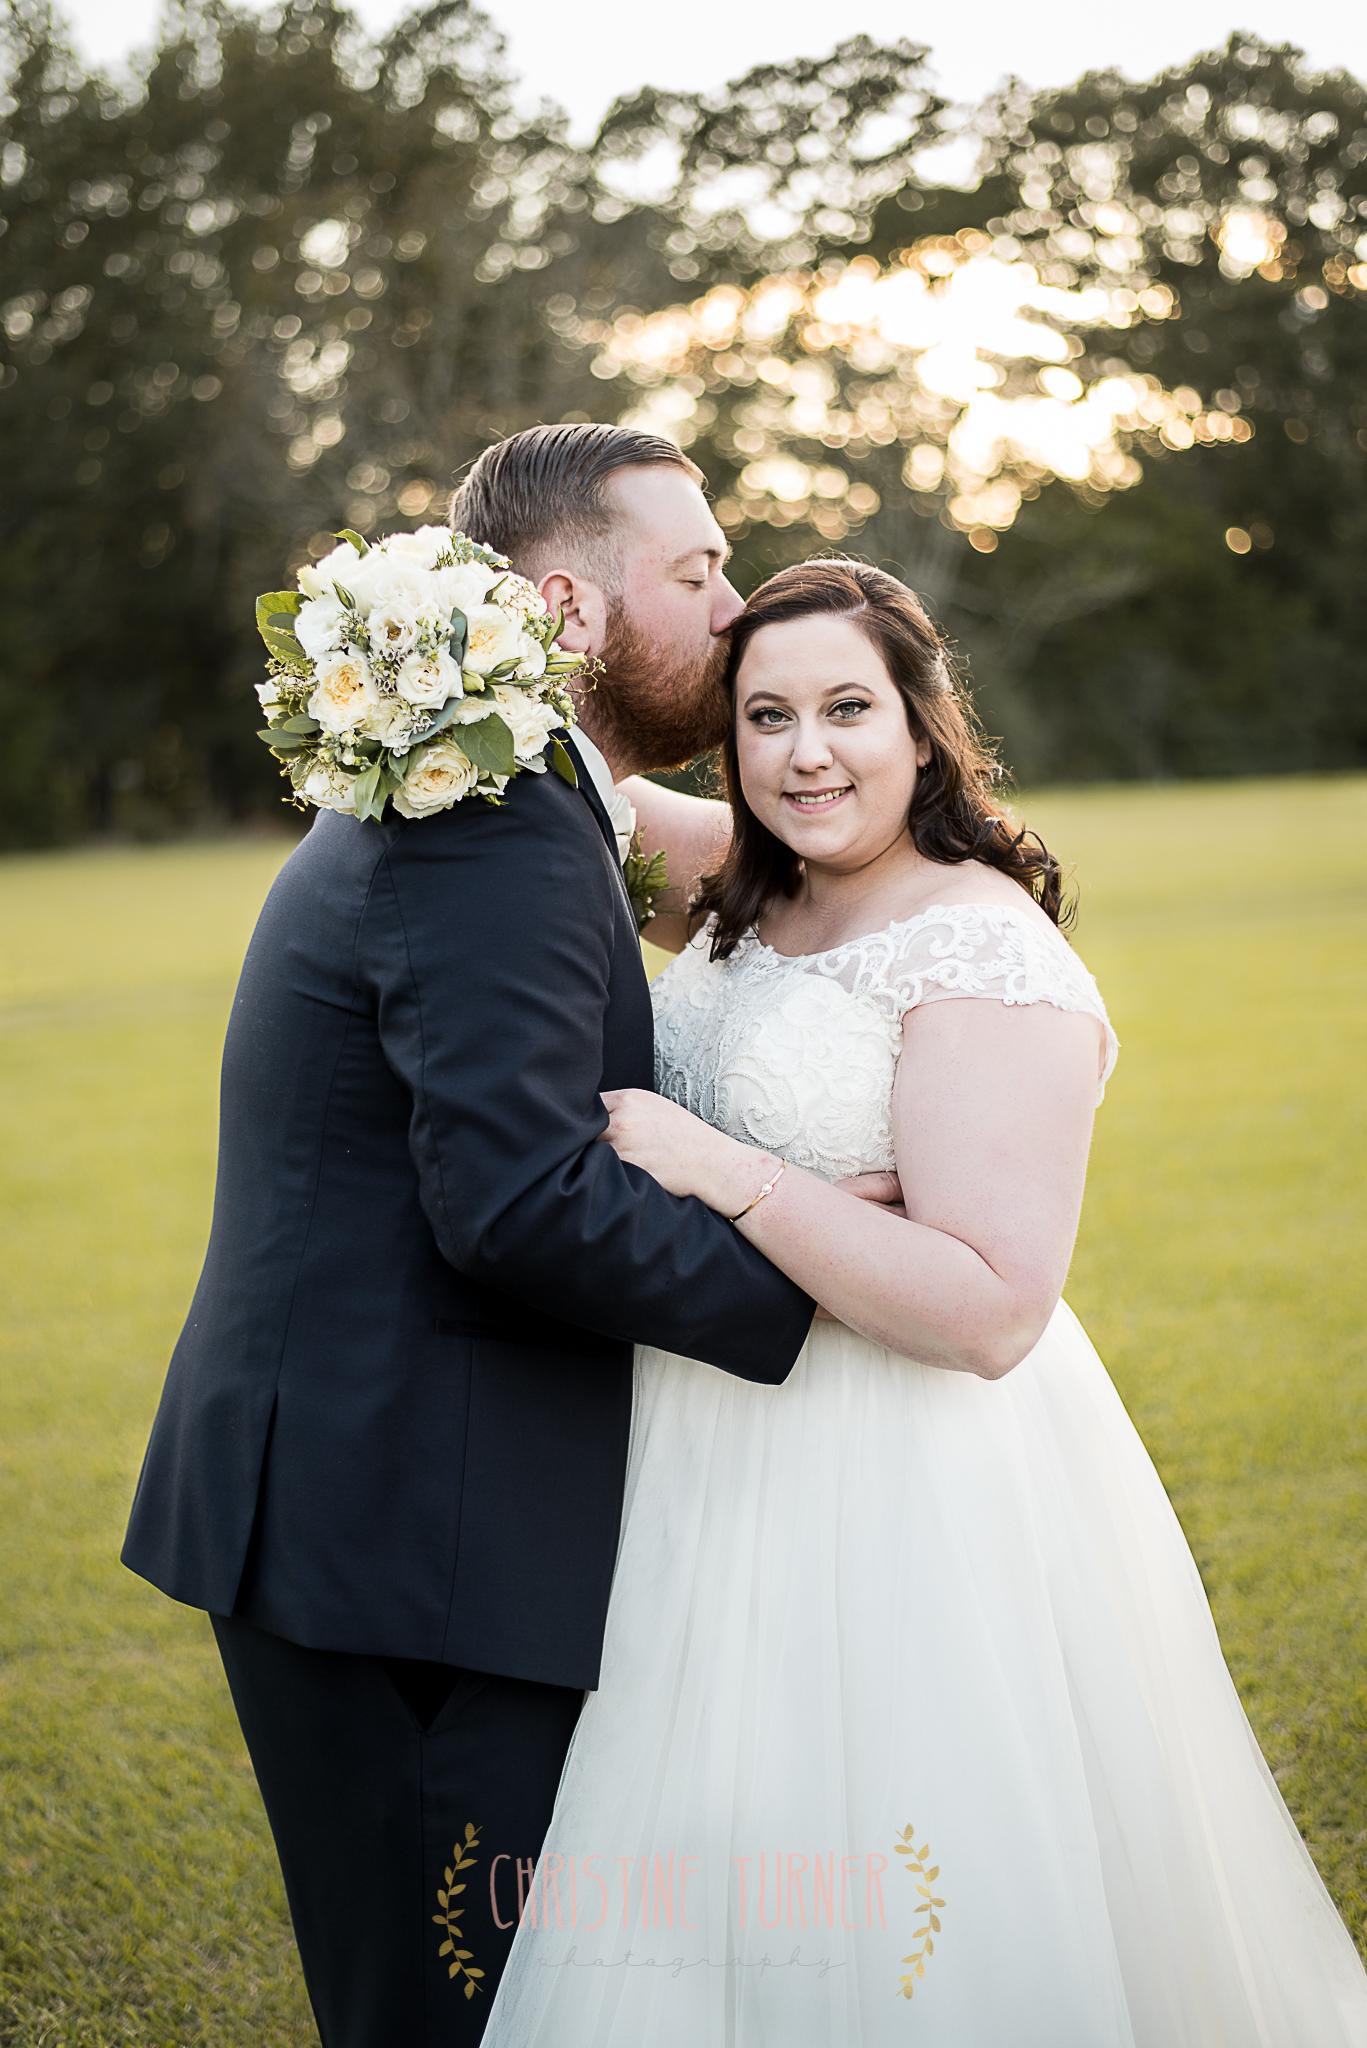 J&D Wedding (21 of 24)